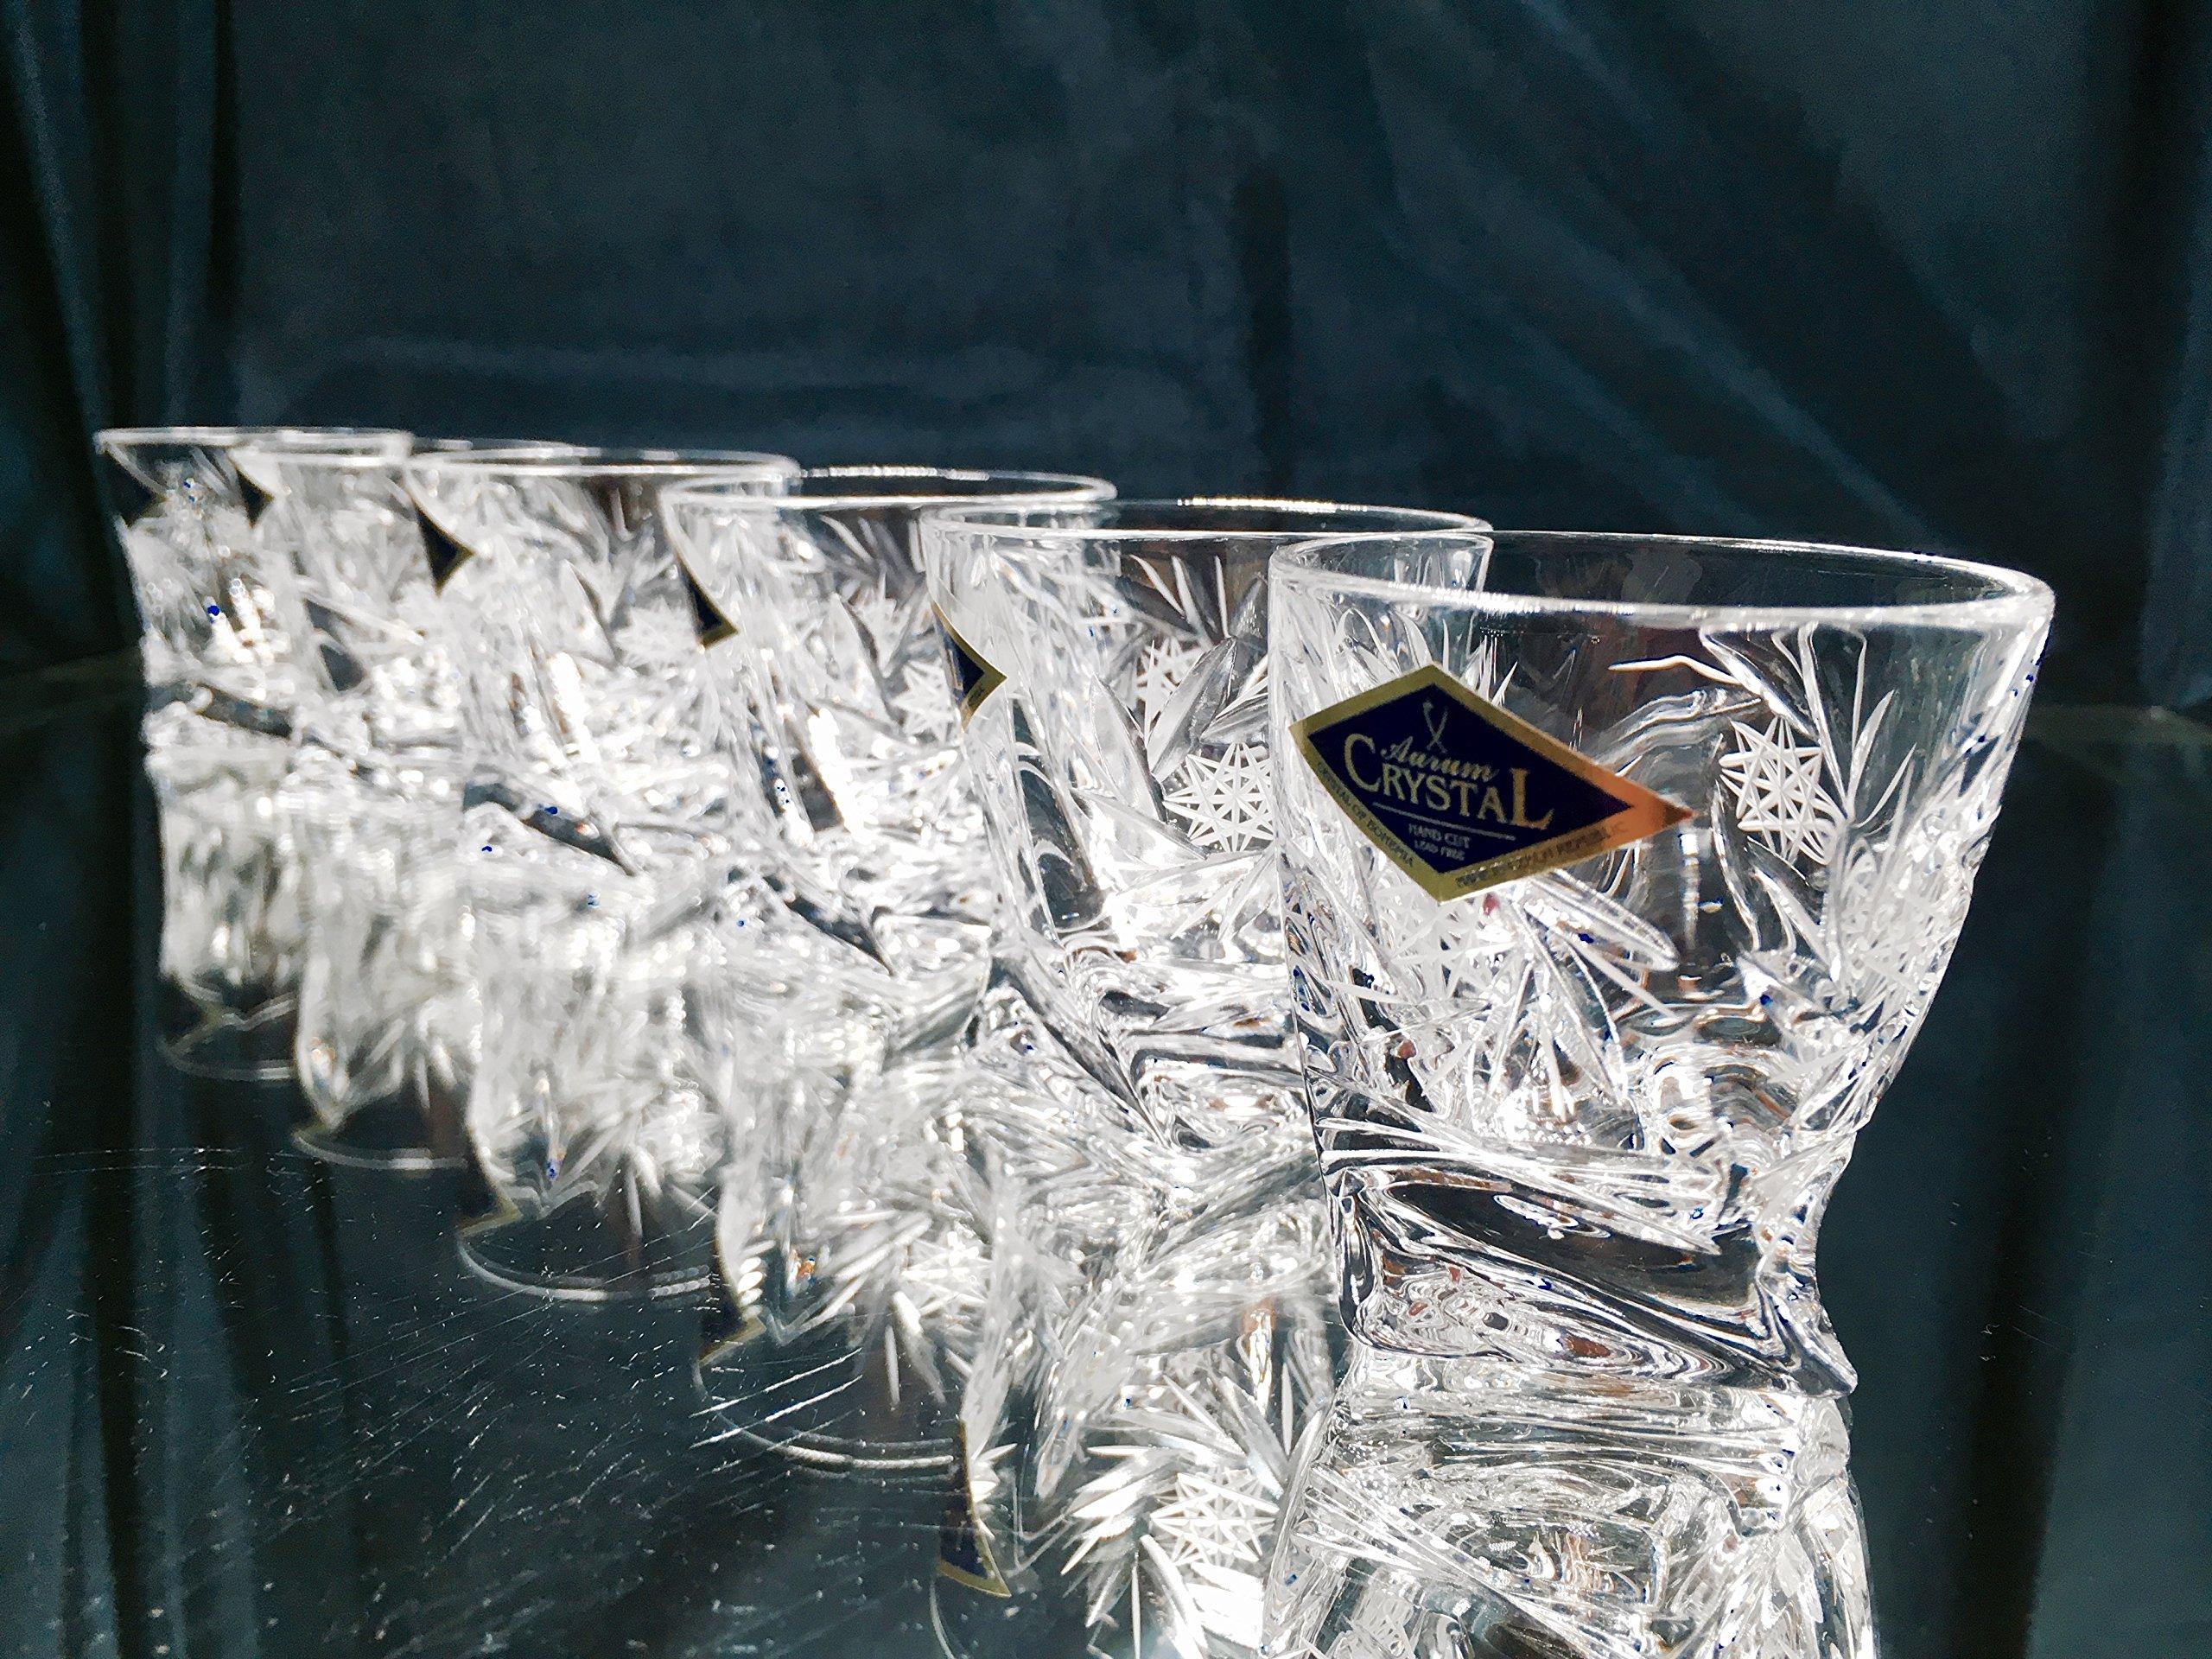 BOHEMIA CRYSTAL SHOT GLASSES 2oz. SET OF 6 HAND CUT CRYSTAL GLASS SHOTS for VODKA WHISKEY CORDIAL LIQUEUR SHERRY BRANDY COGNAC ELEGANT VINTAGE EUROPEAN DESIGN CLASSIC CZECH CRYSTAL GLASS by Aurum